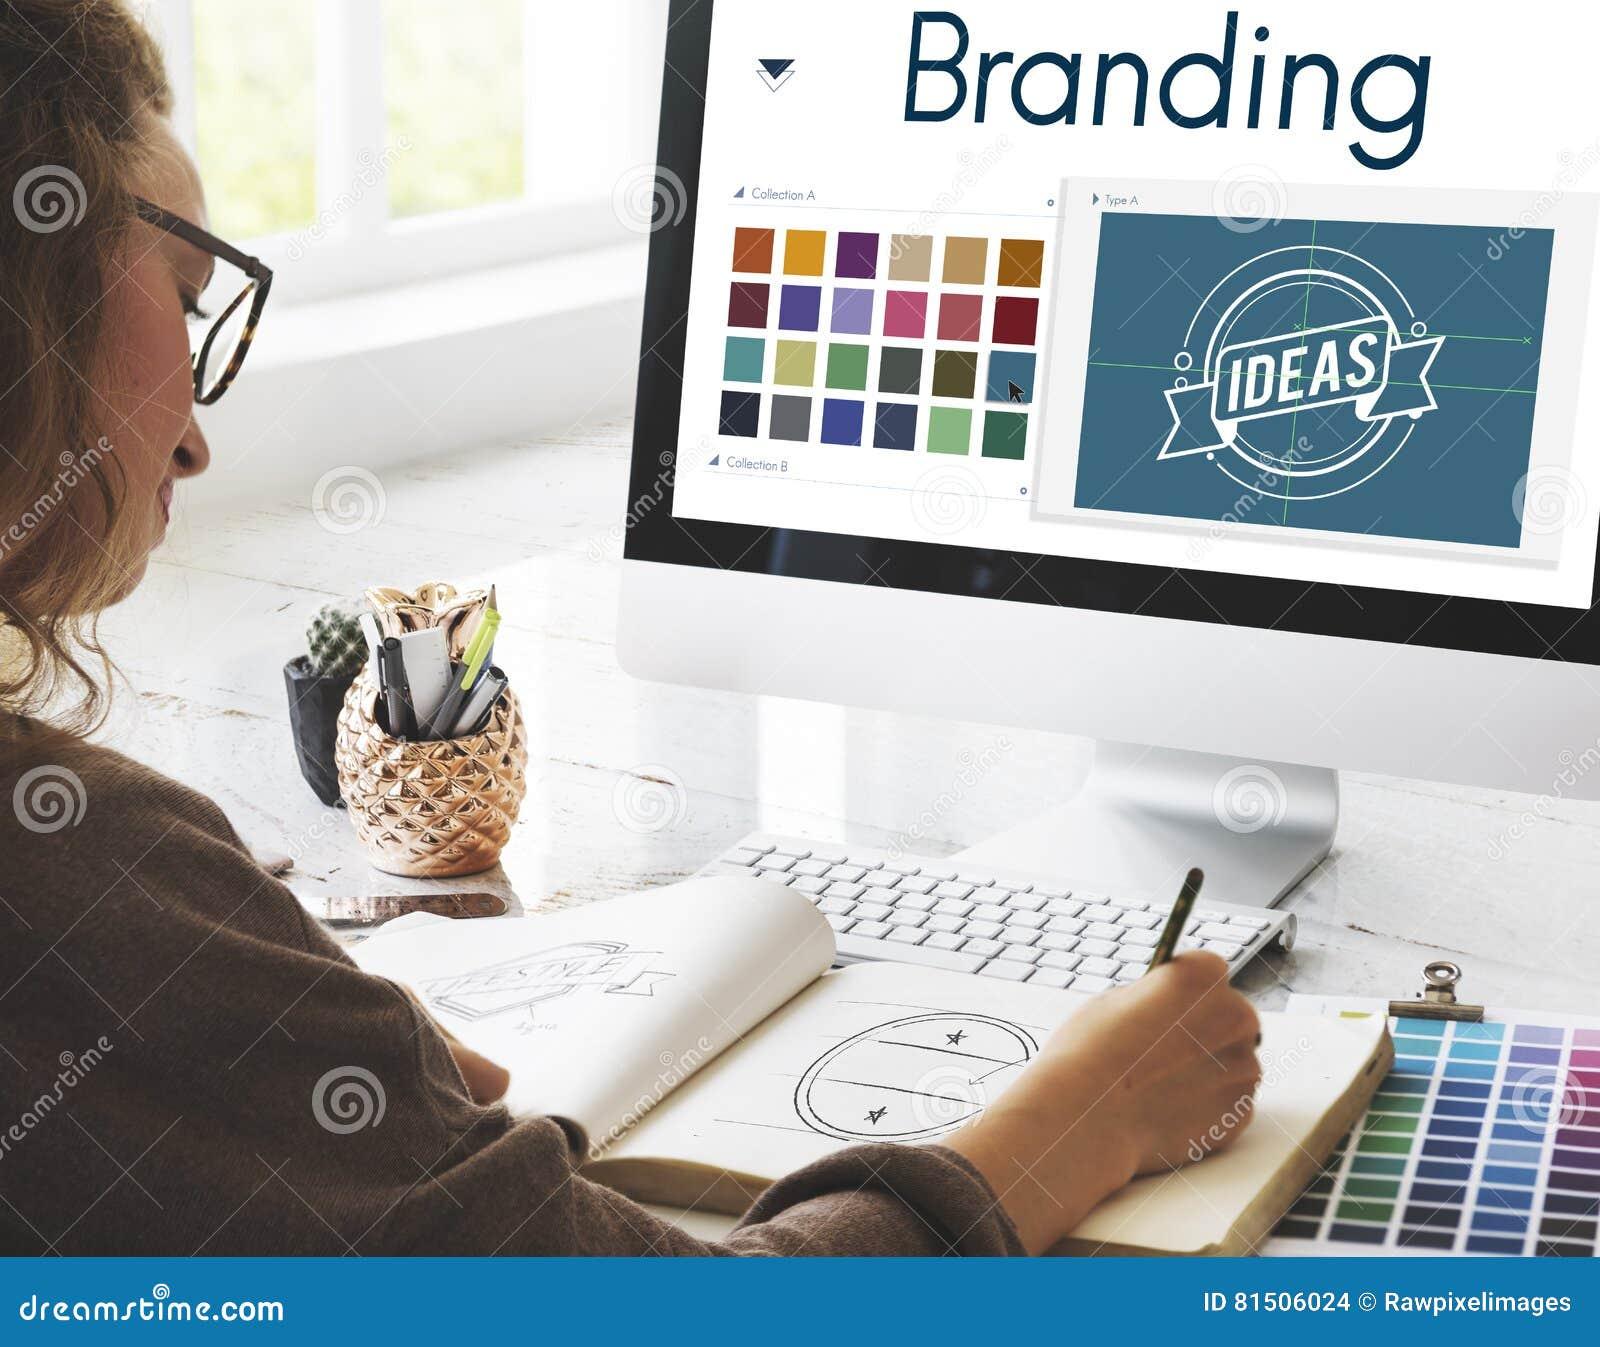 Branding Ideas Design Identitiy Marketing Concept